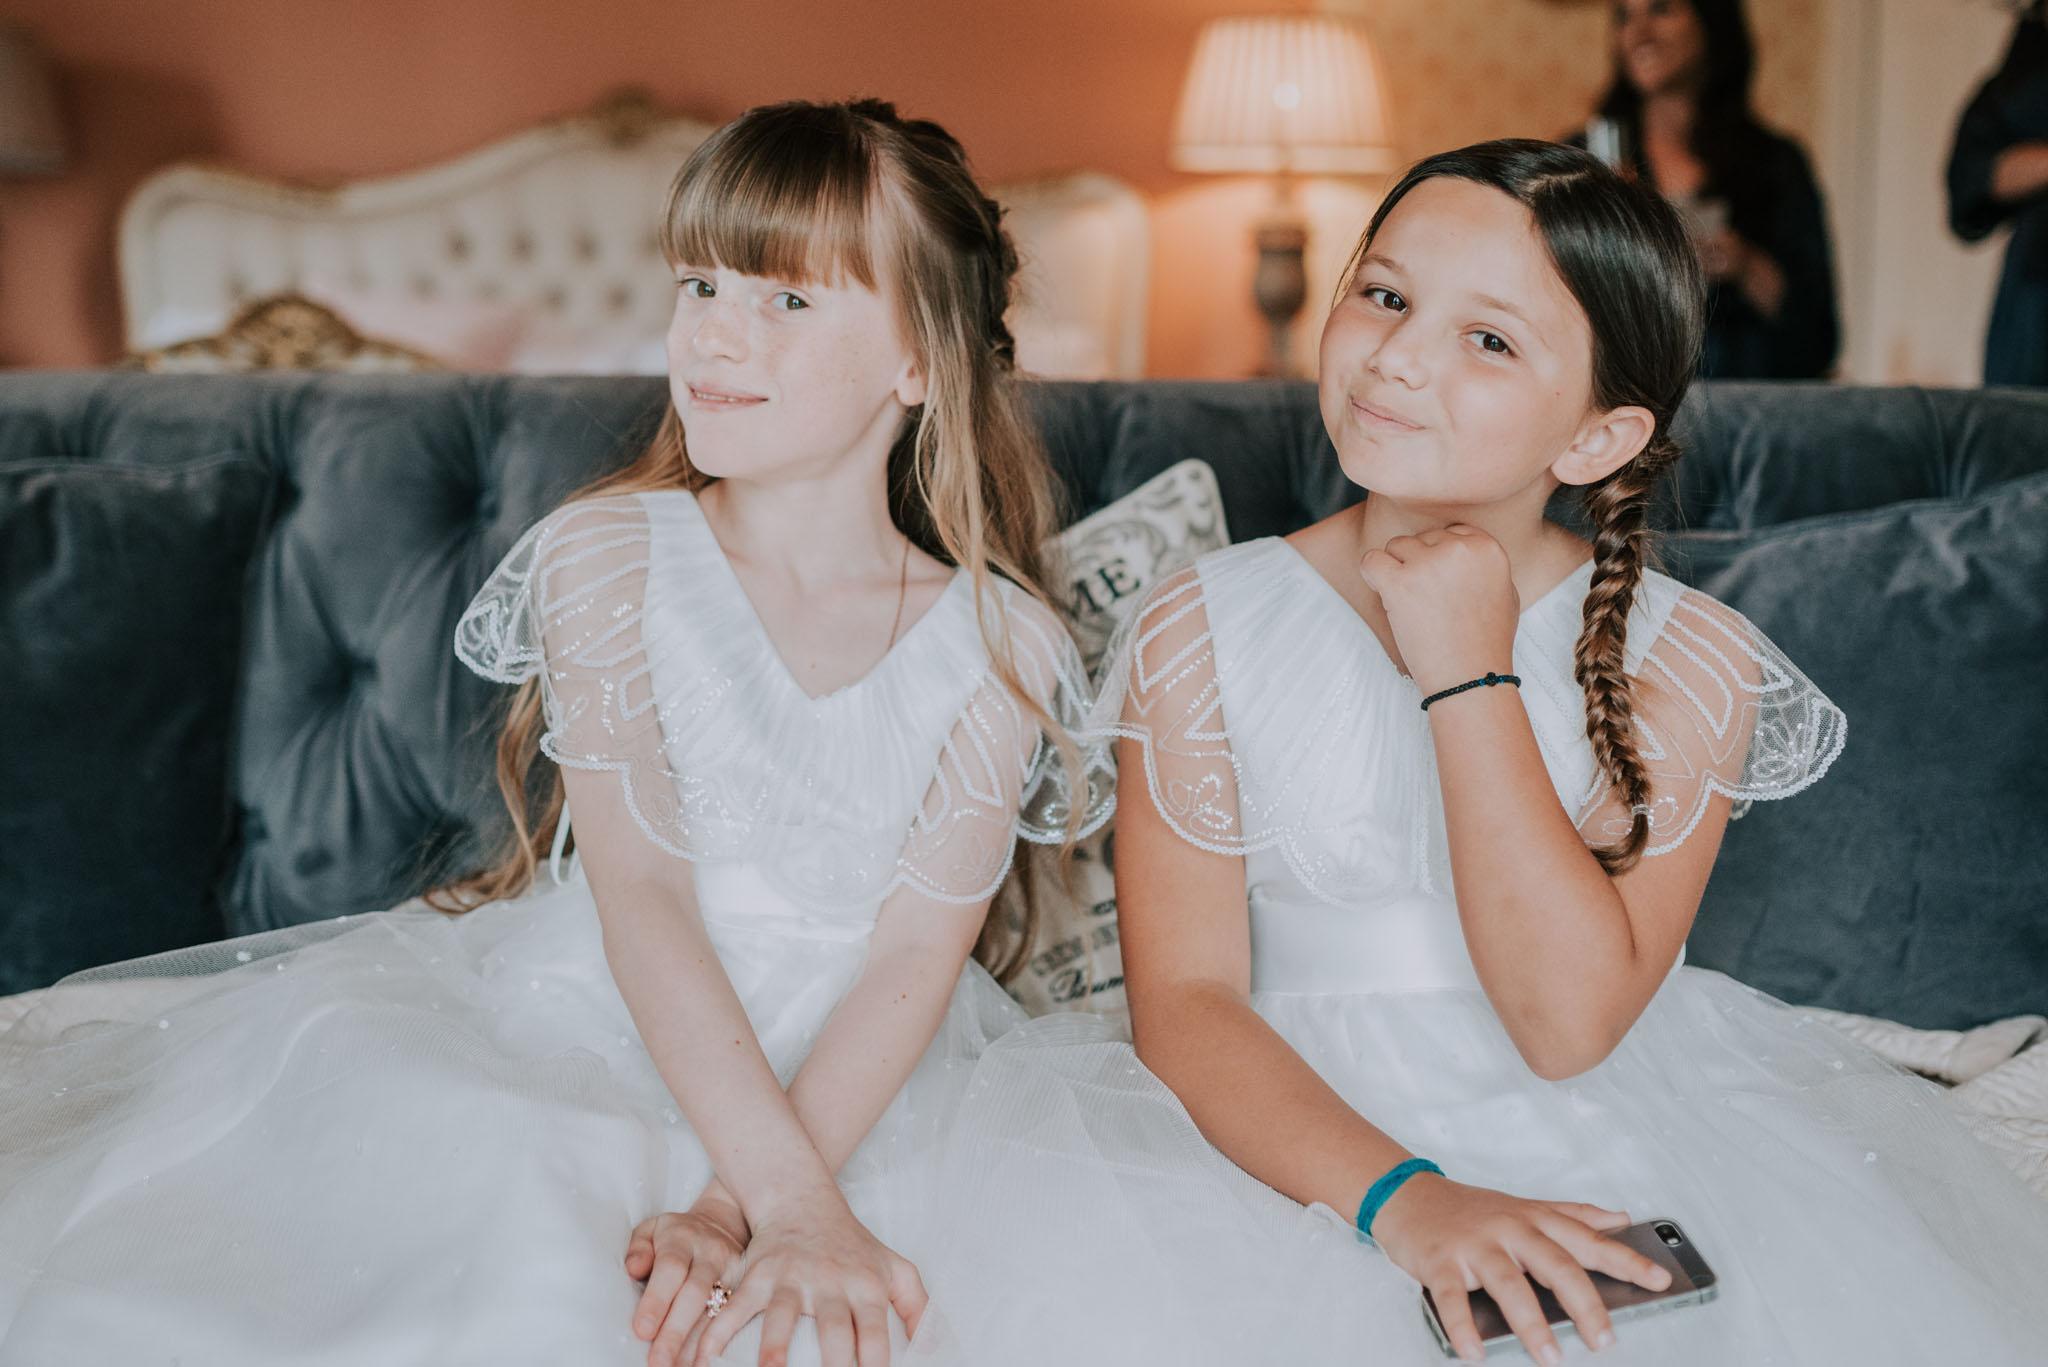 wedding-photographer-glewstone-court-hereford-scott-stockwell-photography084.jpg